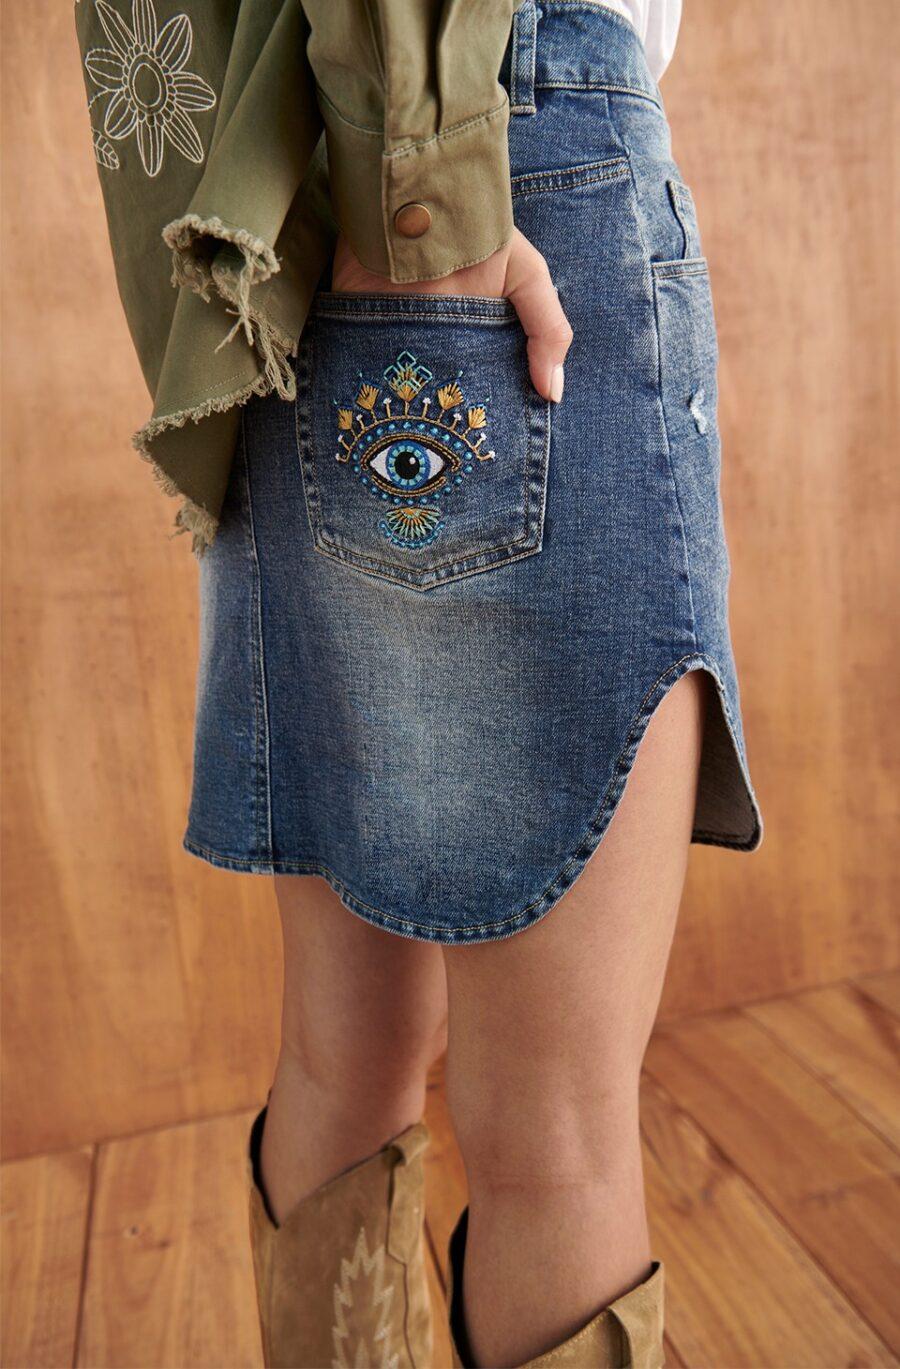 <ul> <li>Mini falda vaquera con corte asimétrico en ambos lados</li> <li>Marca Fetiche.</li> <li>Detalle de bordado de ojo en uno de los bolsillos traseros</li> <li>Se adapta súper bien al cuerpo porque es muy elástica</li> <li>70% Algodón y 30% Nylon</li> <li>La modelo mide 1.80cm y lleva la talla S</li> </ul> Alabama Shop